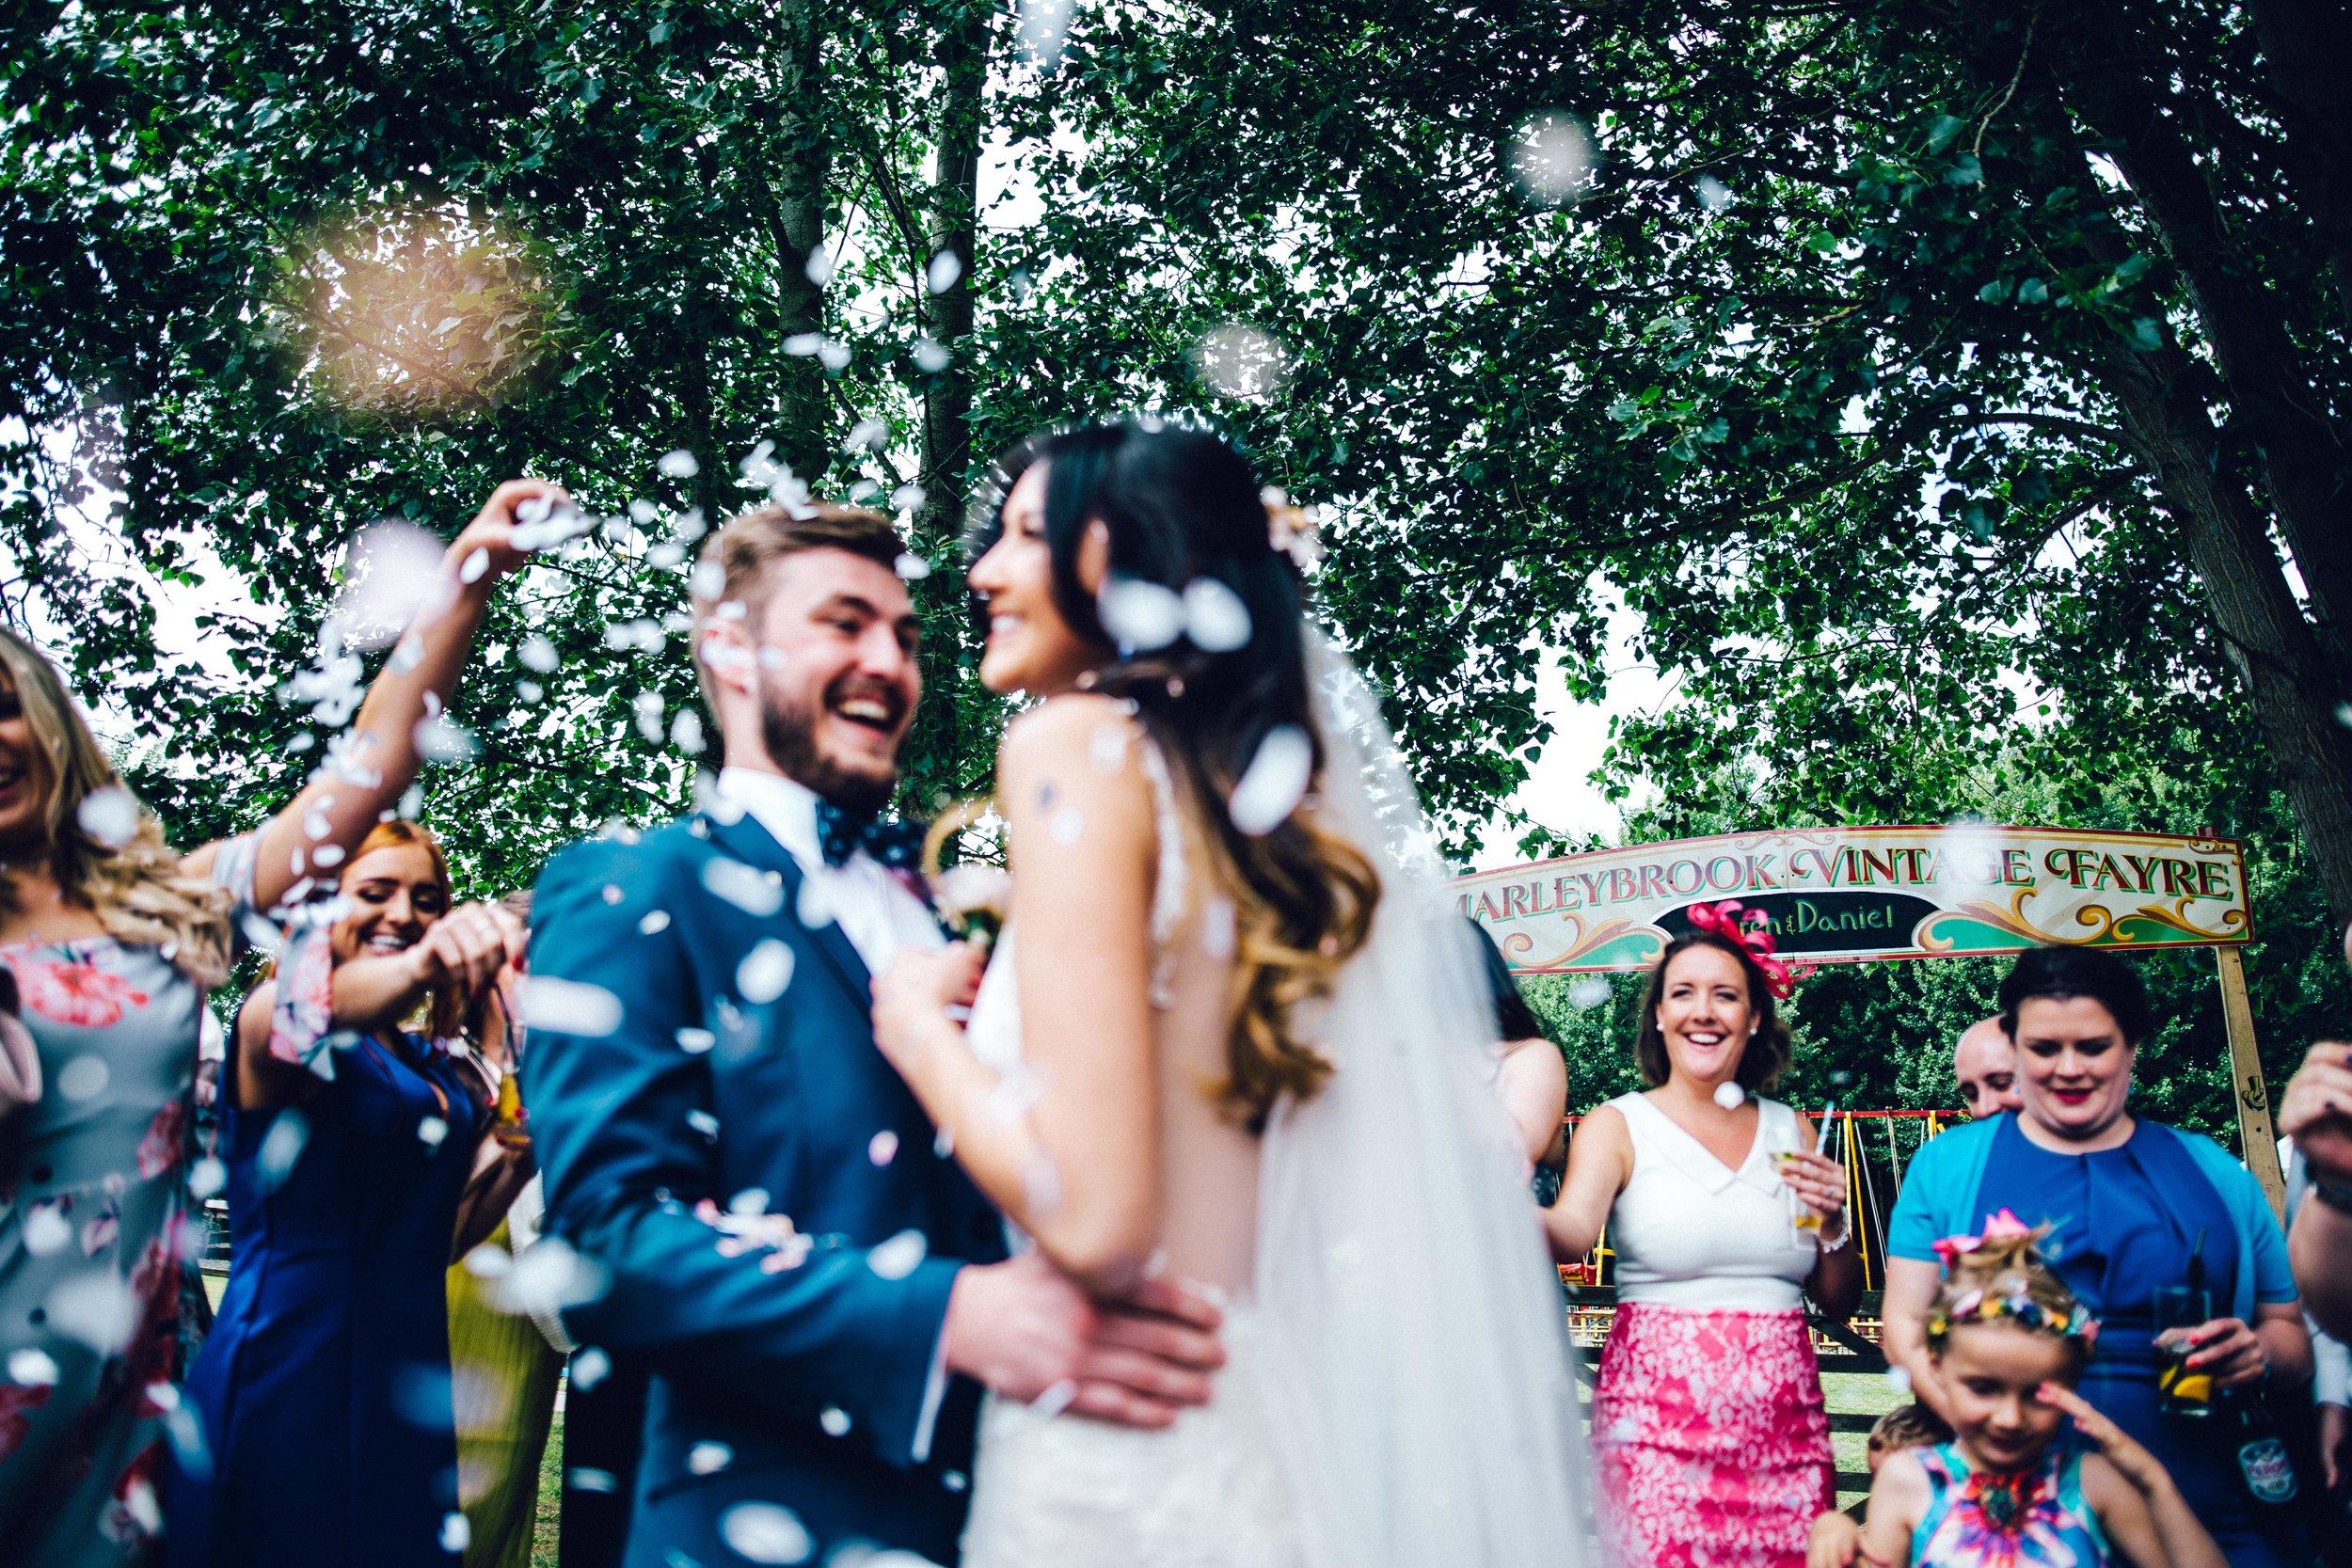 kent-wedding-photographer-8265.jpg